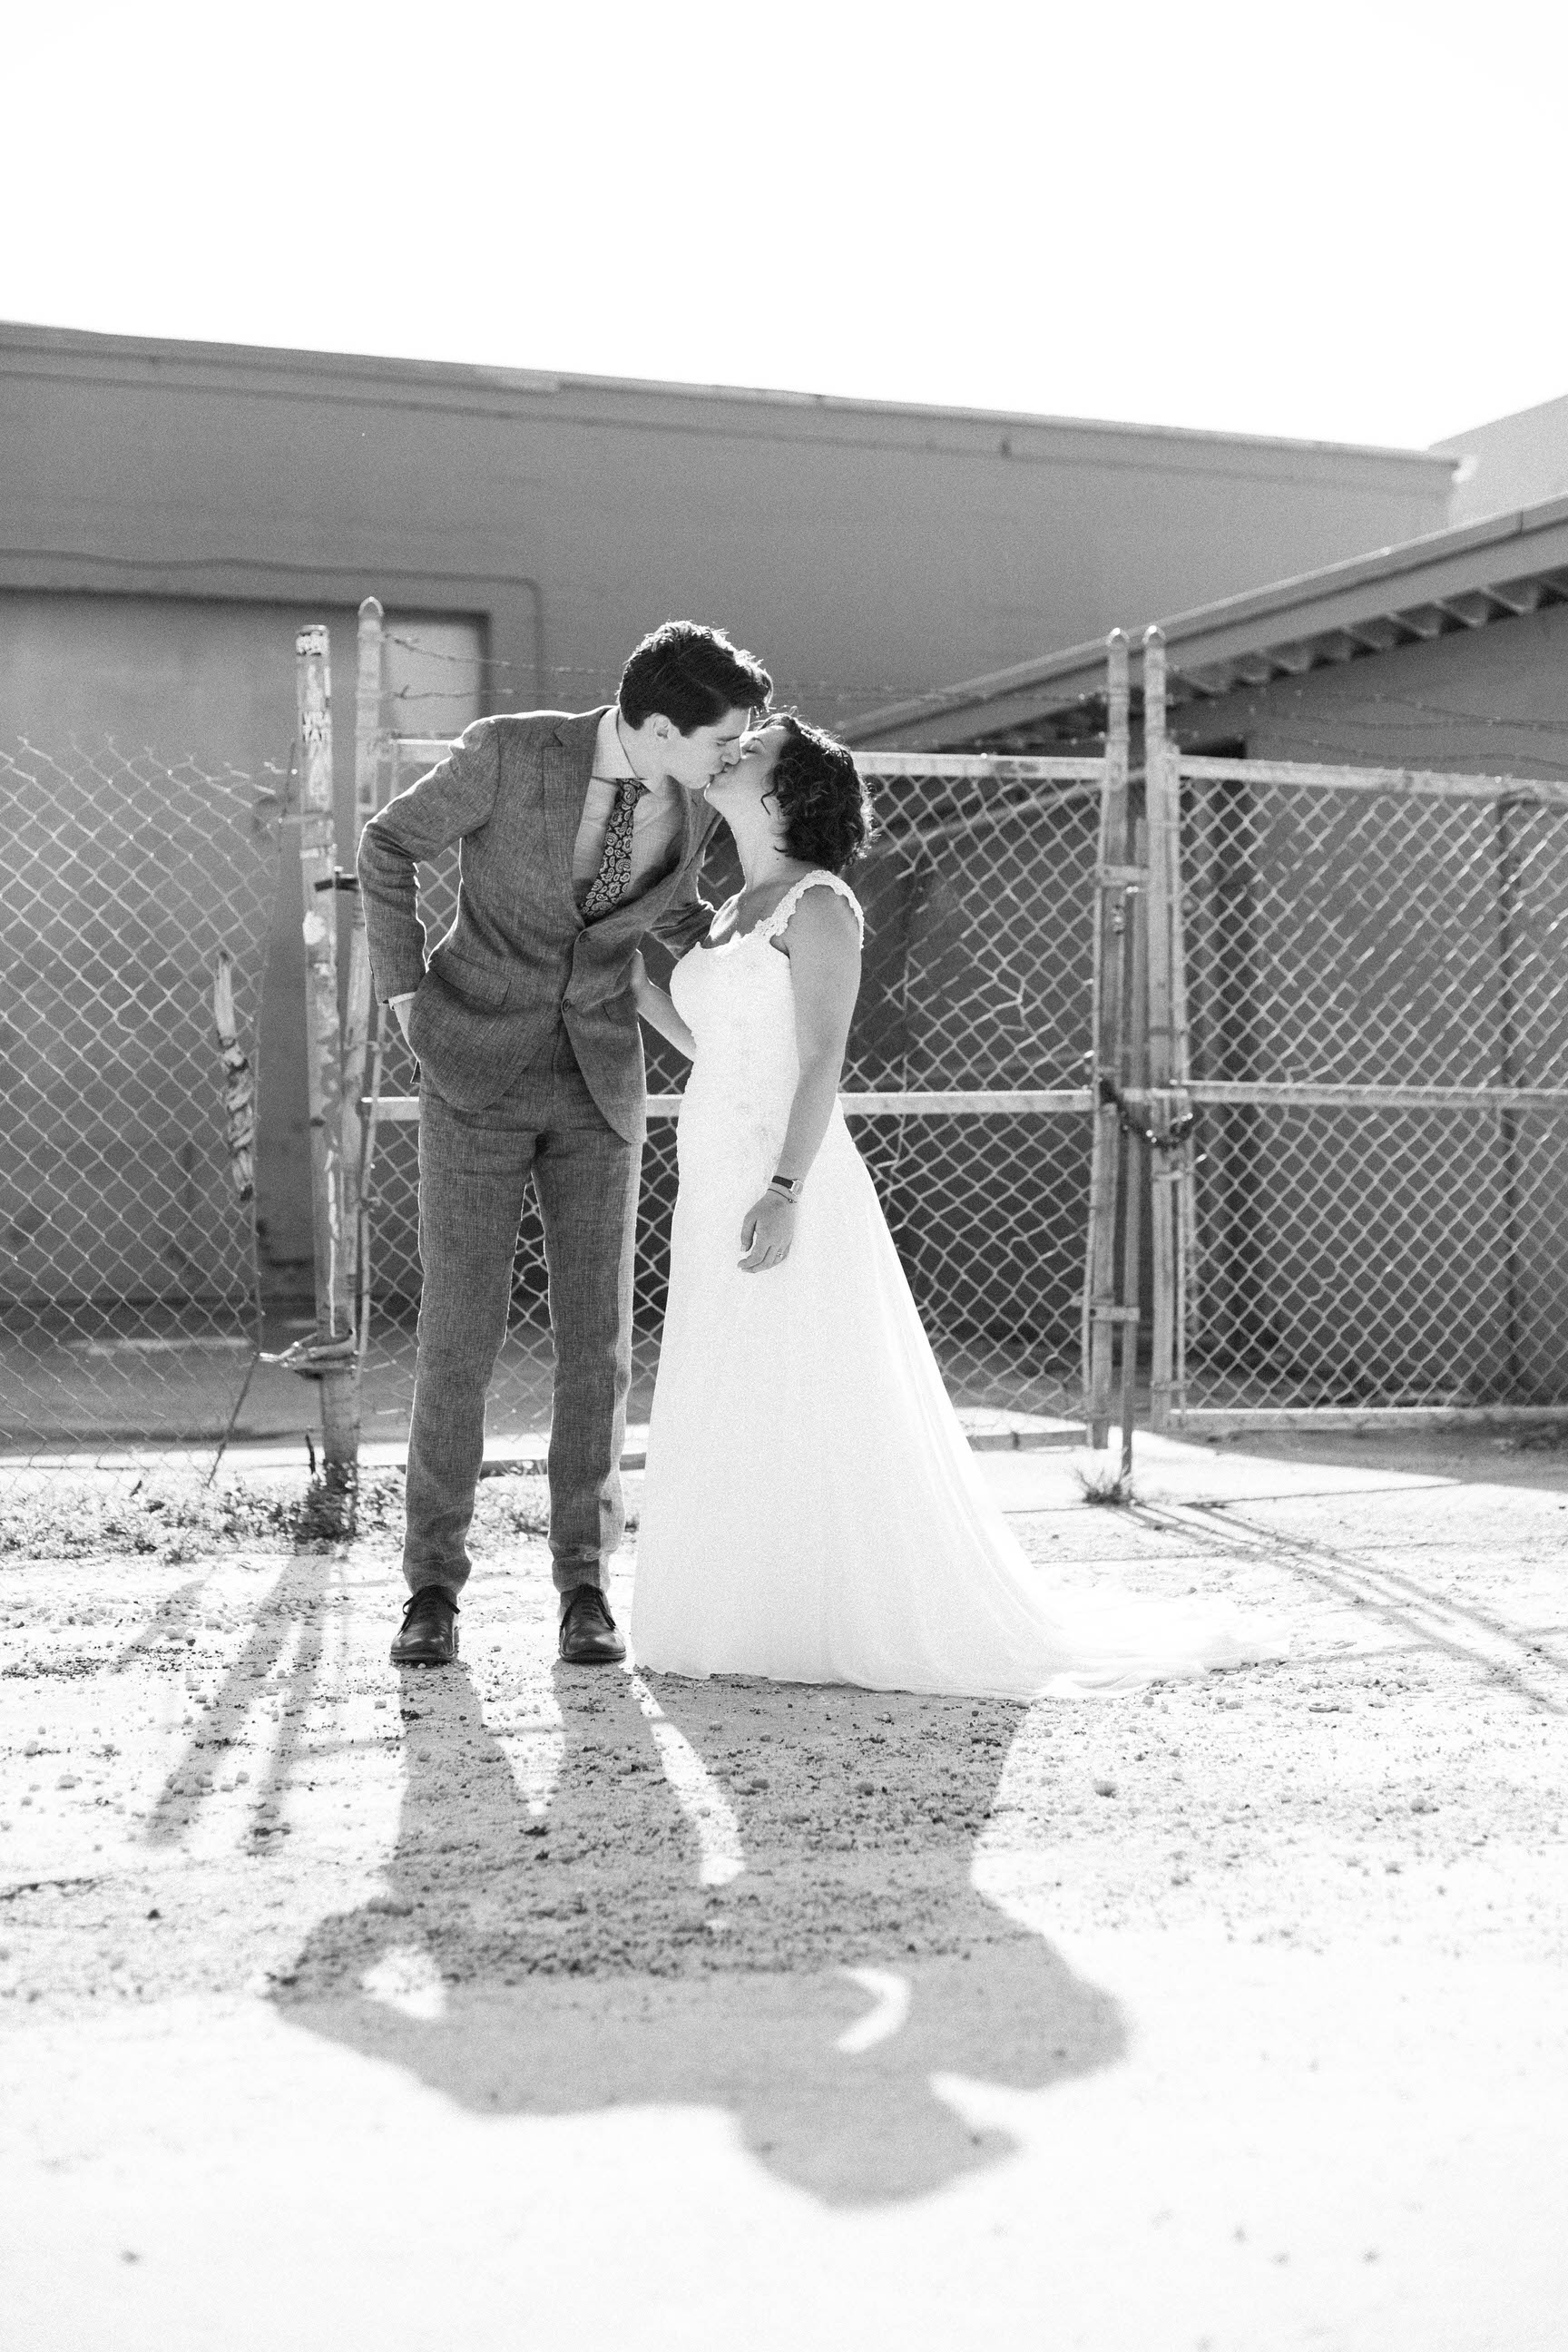 urban-wedding-portraits-fort-lauderdale-rustic-tiny-house-photo.jpg